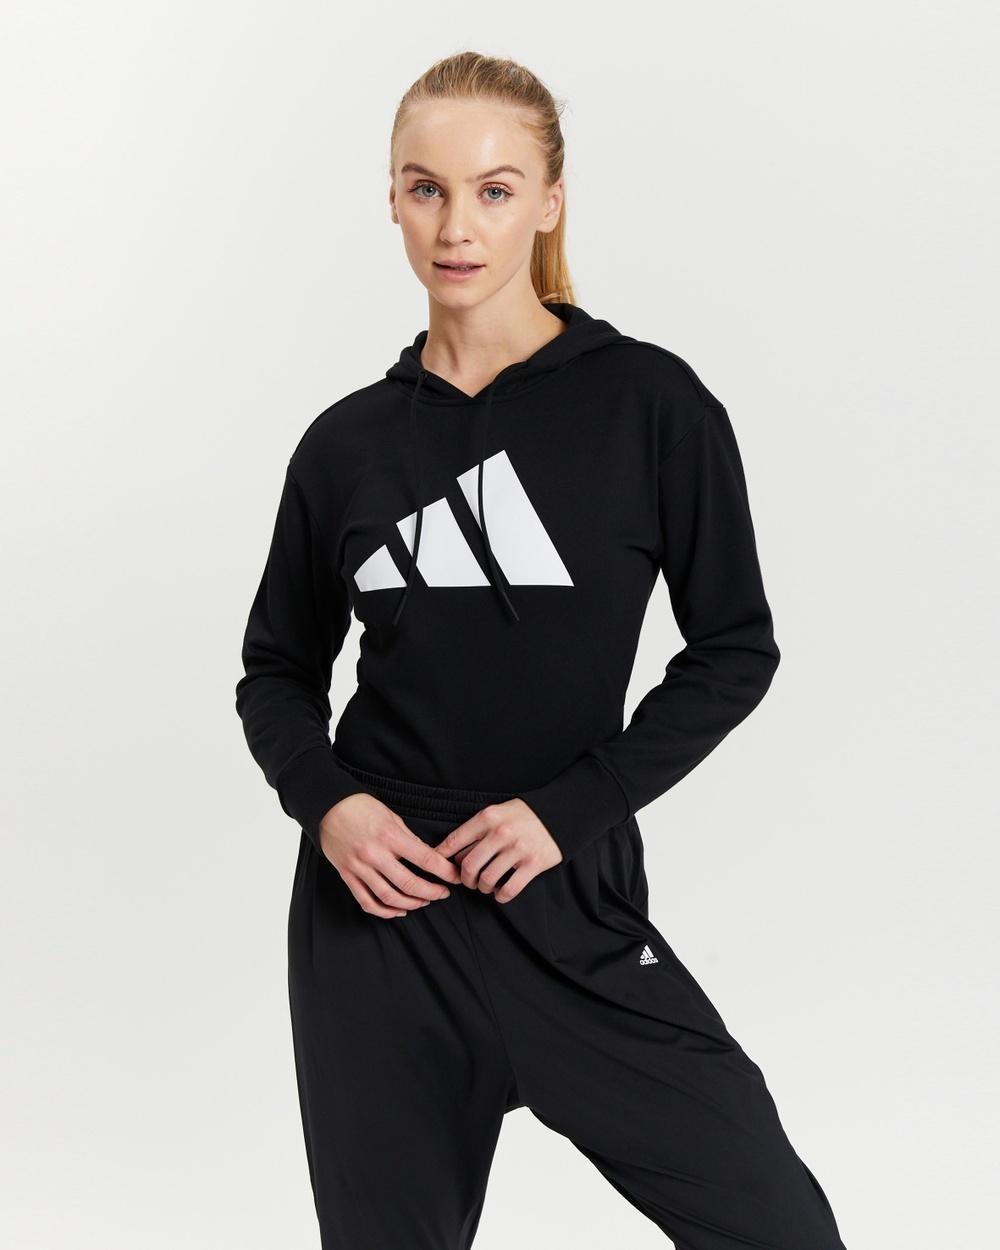 adidas Performance Future Icons Leotard Long Sleeve T-Shirts Black